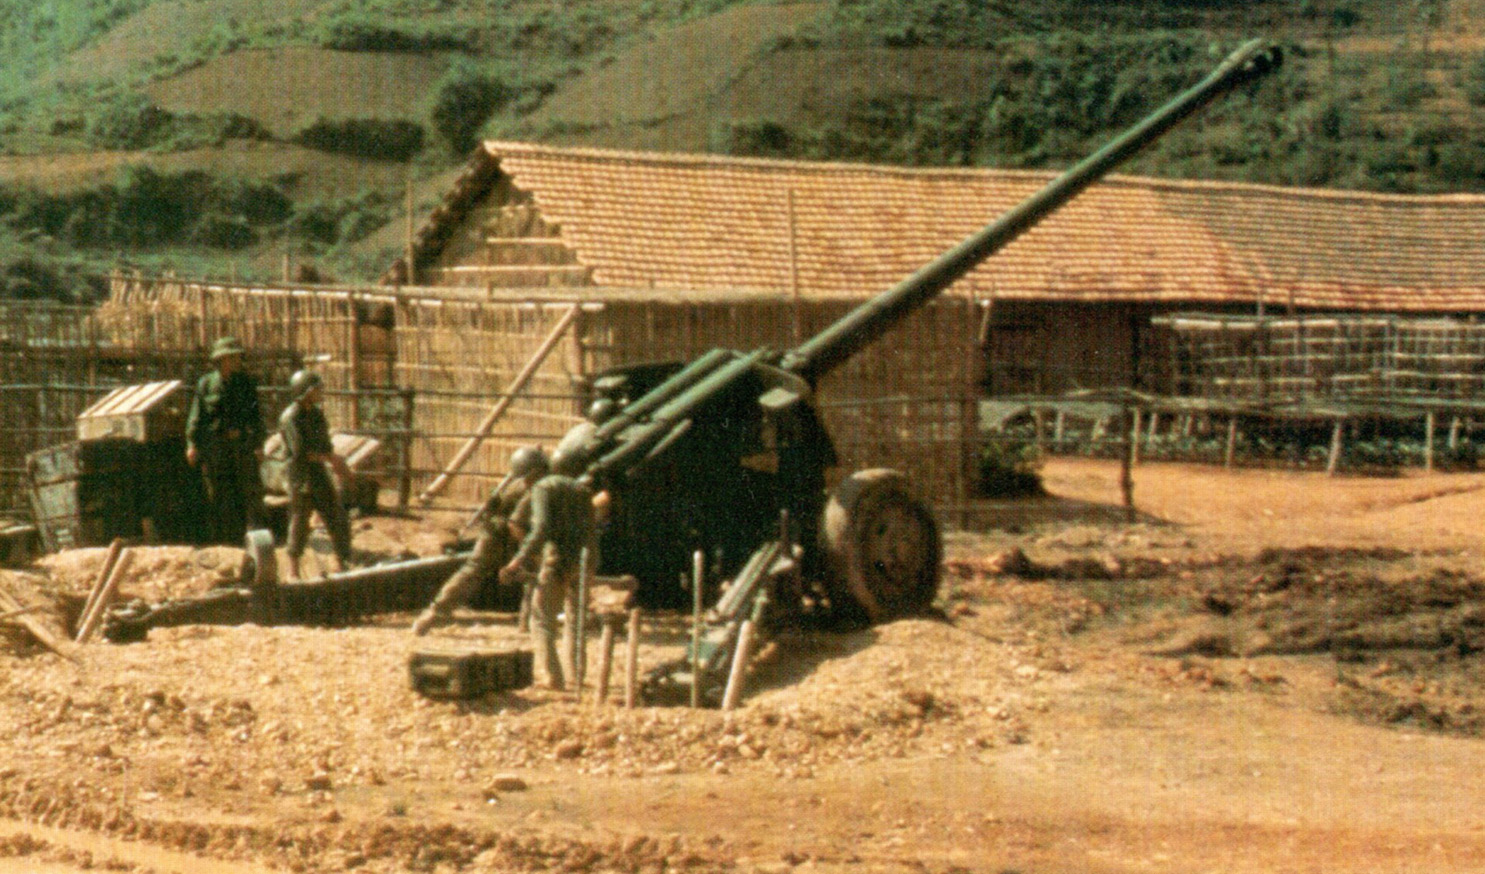 nva_artillery_dmz.jpg